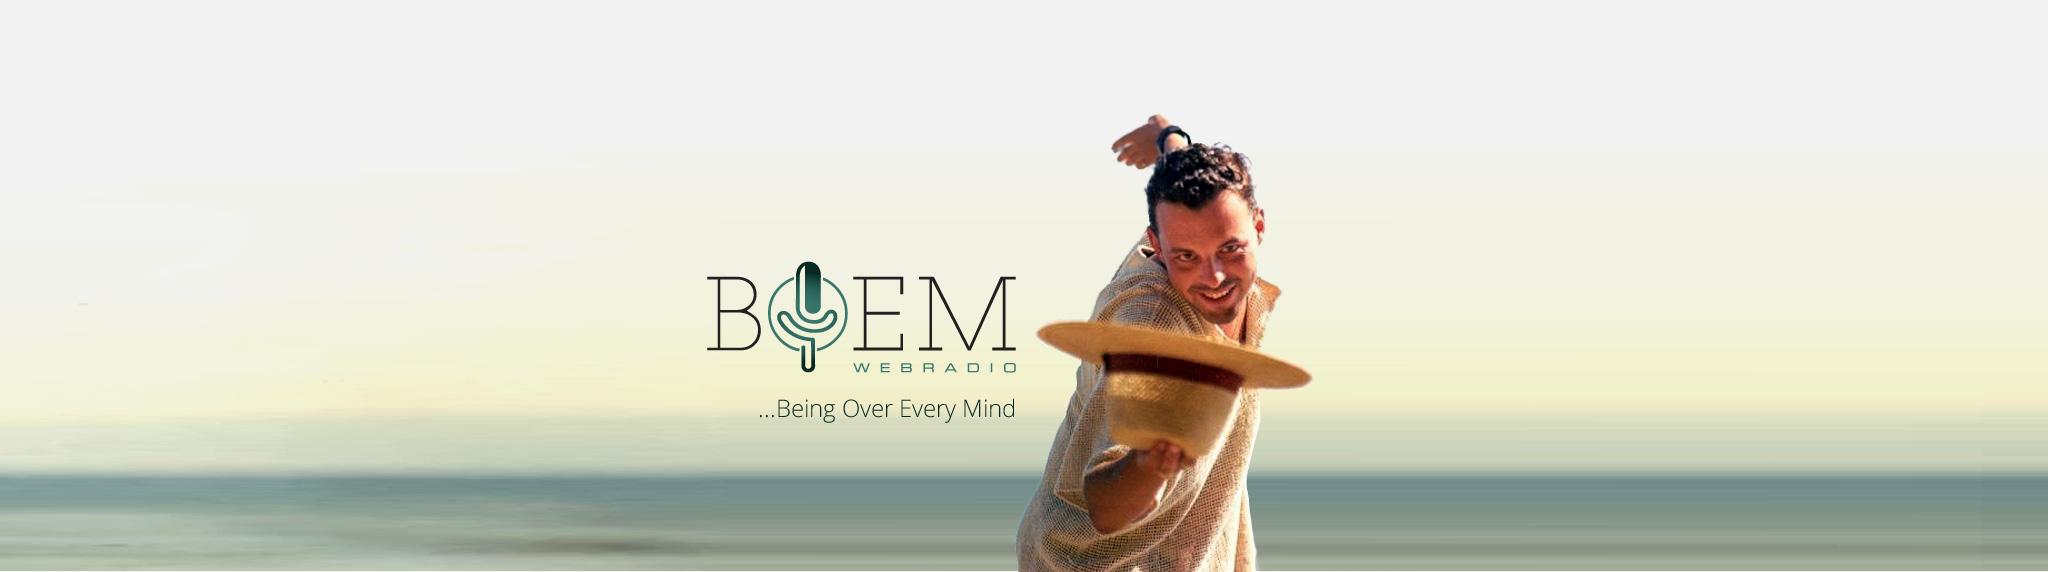 Boem Webradio - Being Over Every Mind